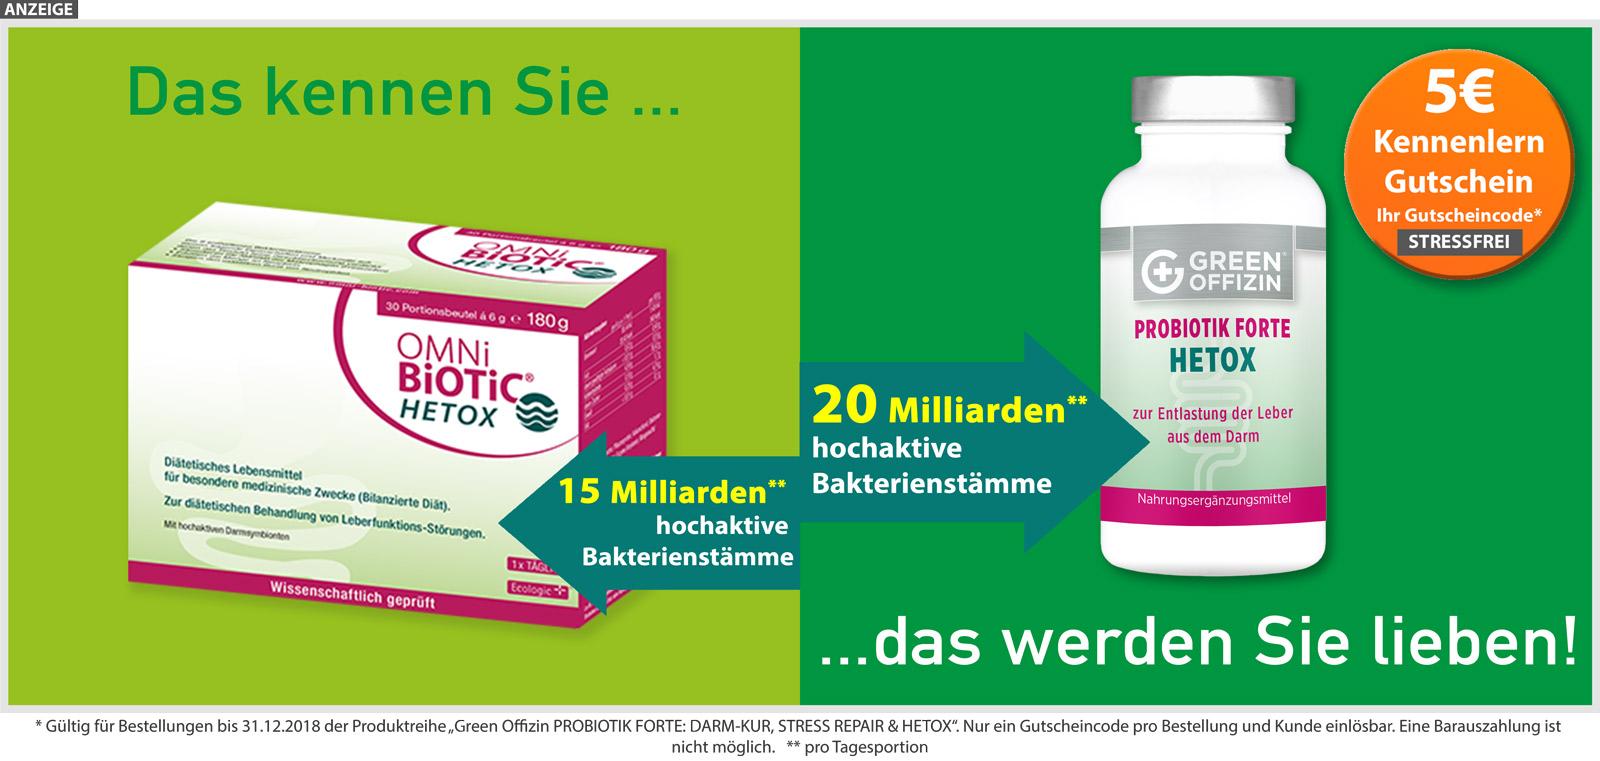 Vergleich-Omnibiotik-Green-Offizin_Probiotik-Forte_Hetox